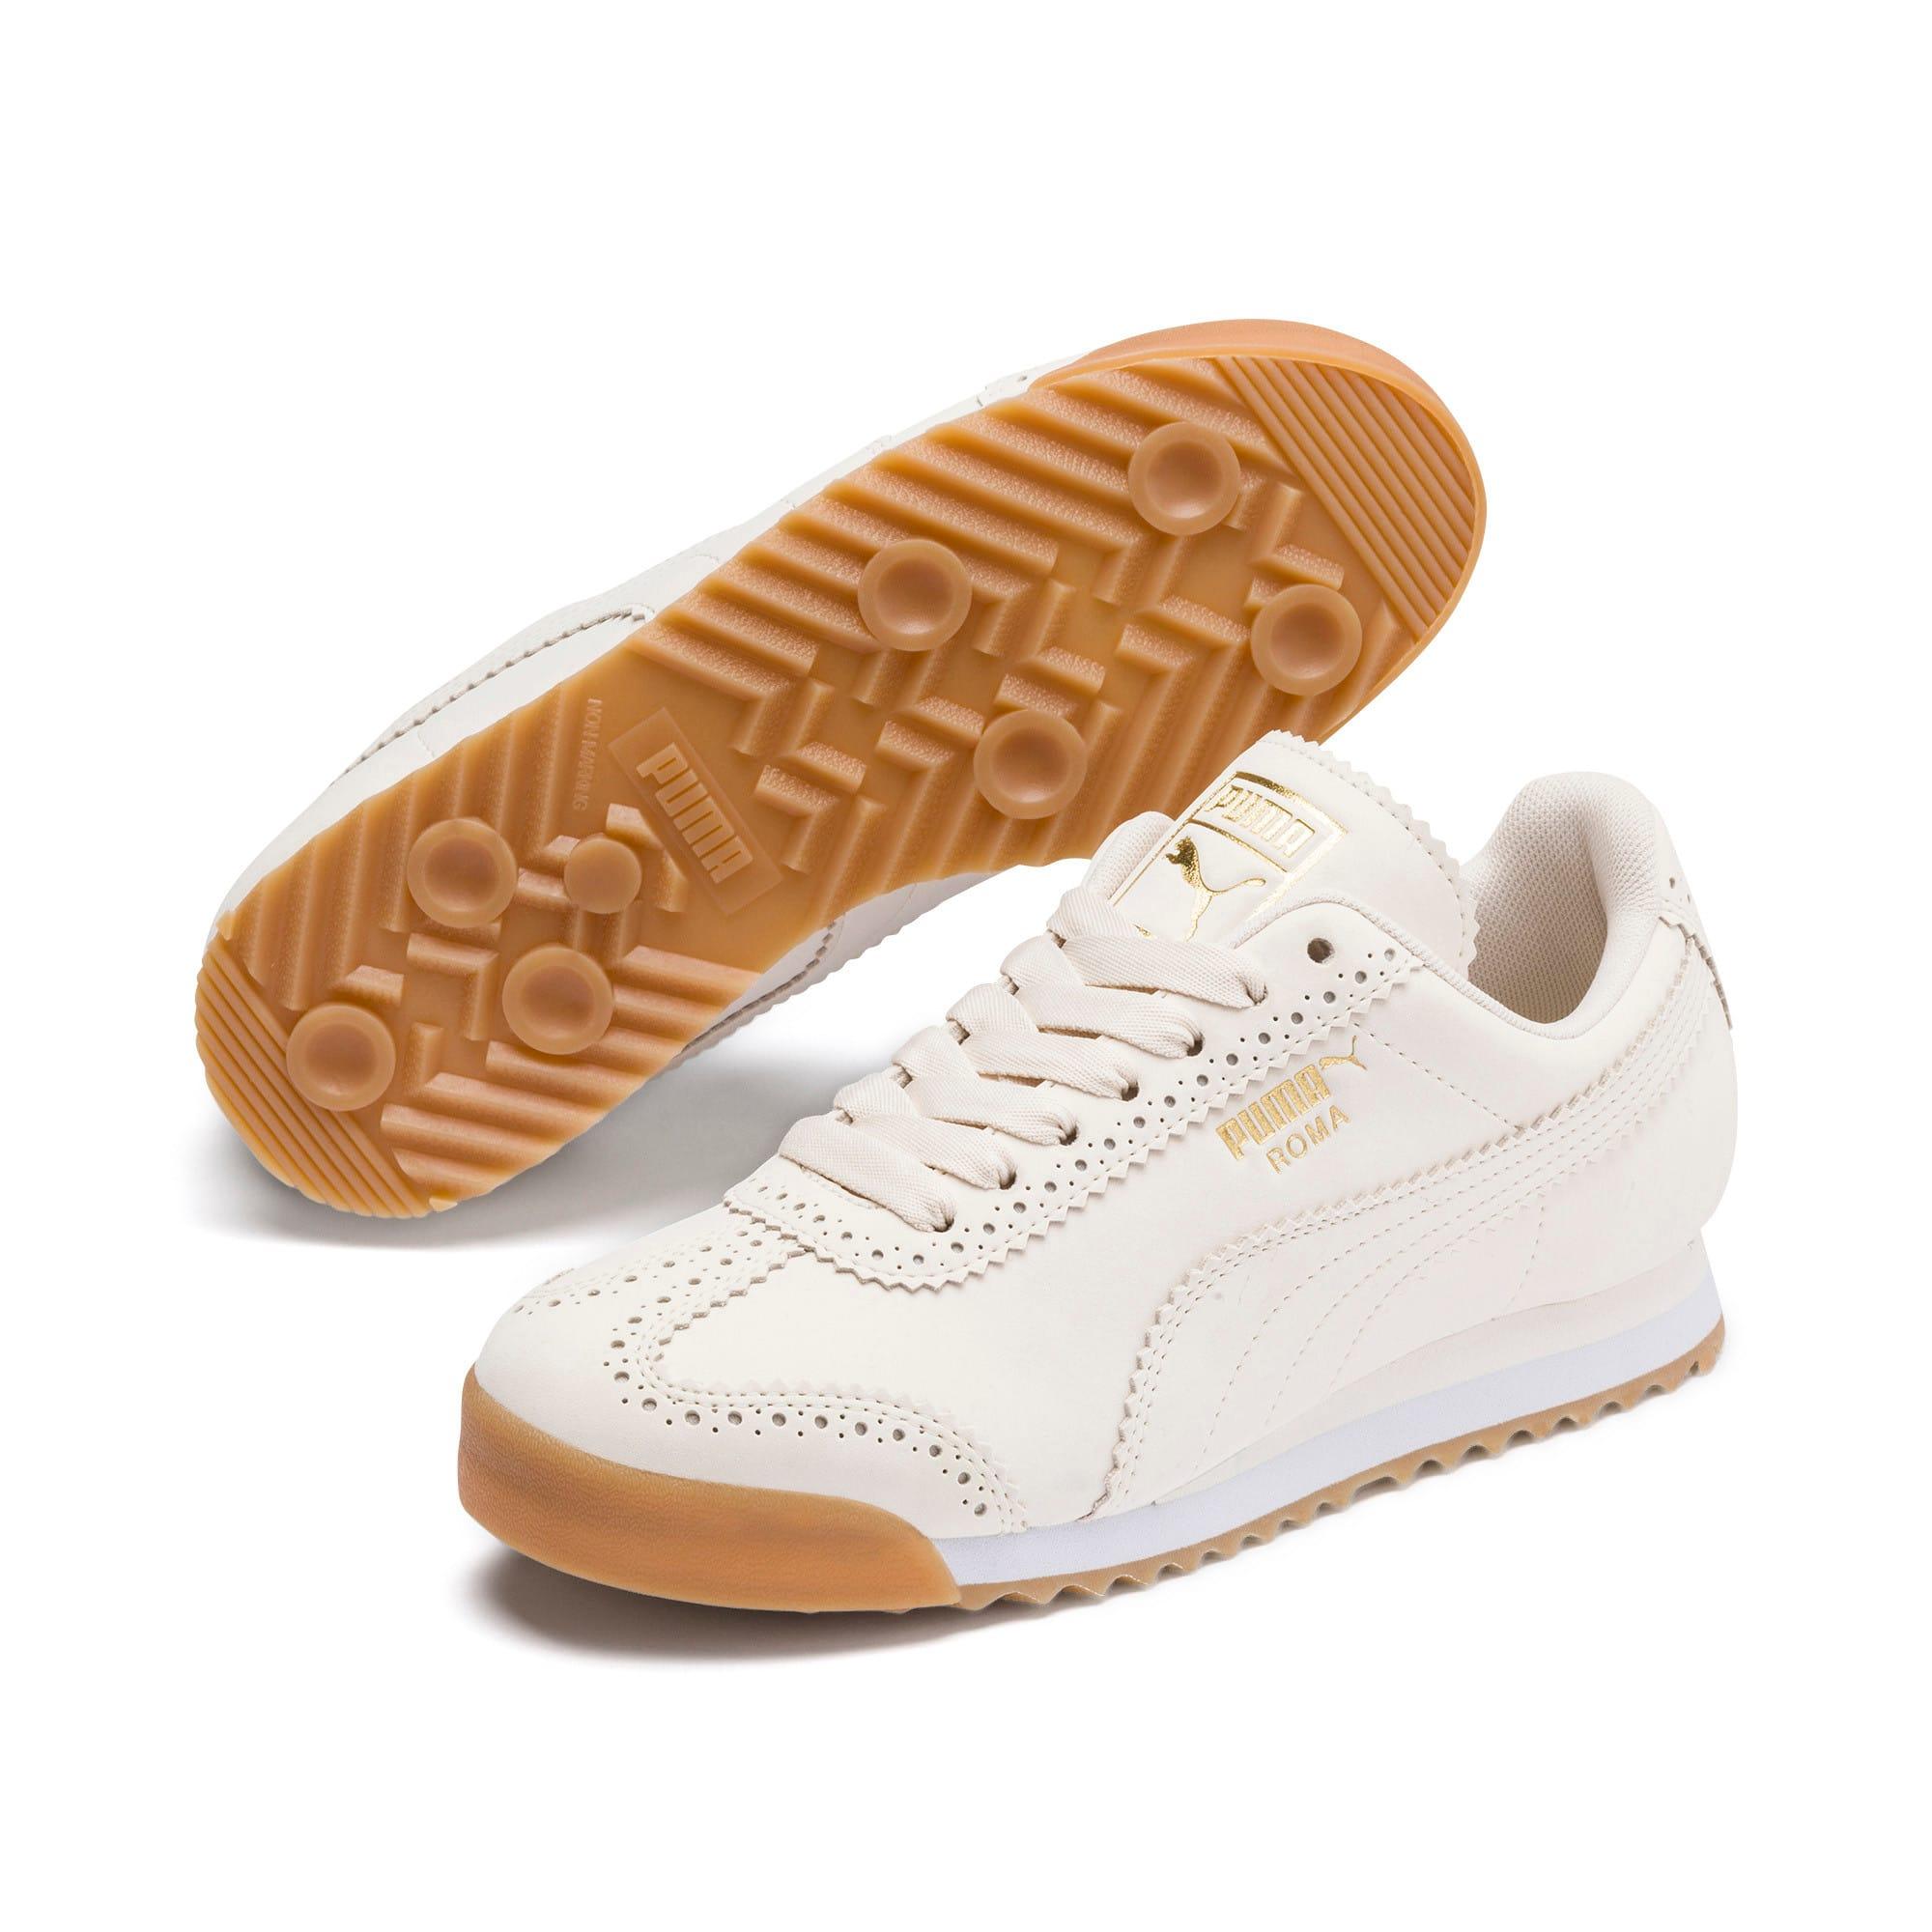 Thumbnail 2 of Roma Brogue Women's Sneakers, Pastel Parchment-P.Team Gold, medium